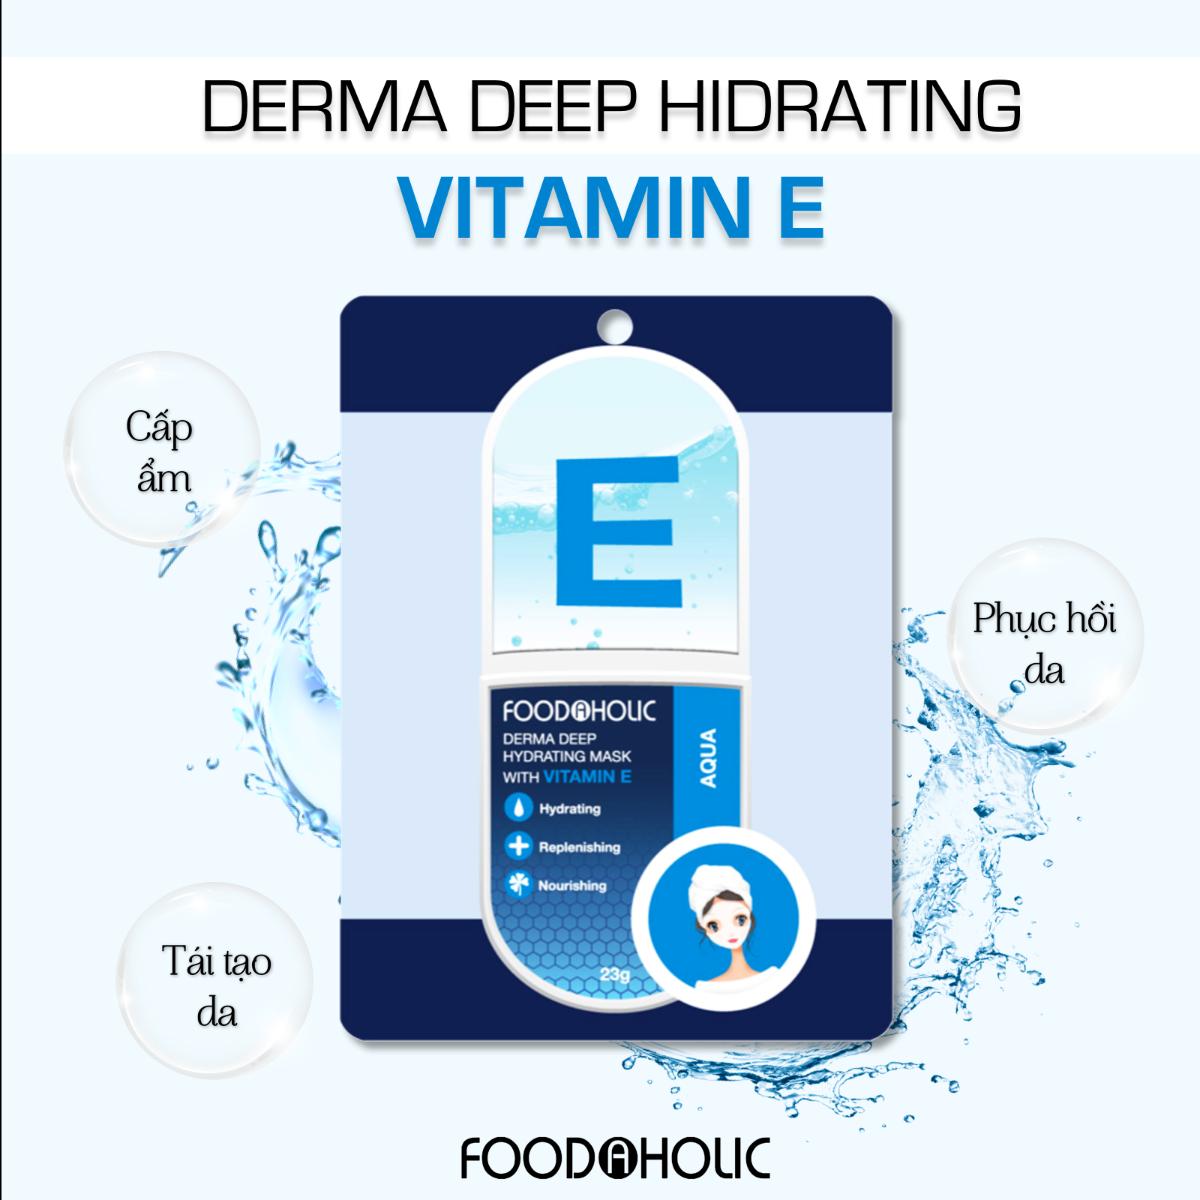 Mặt Nạ FOODAHOLIC Chiết Xuất Vitamin E